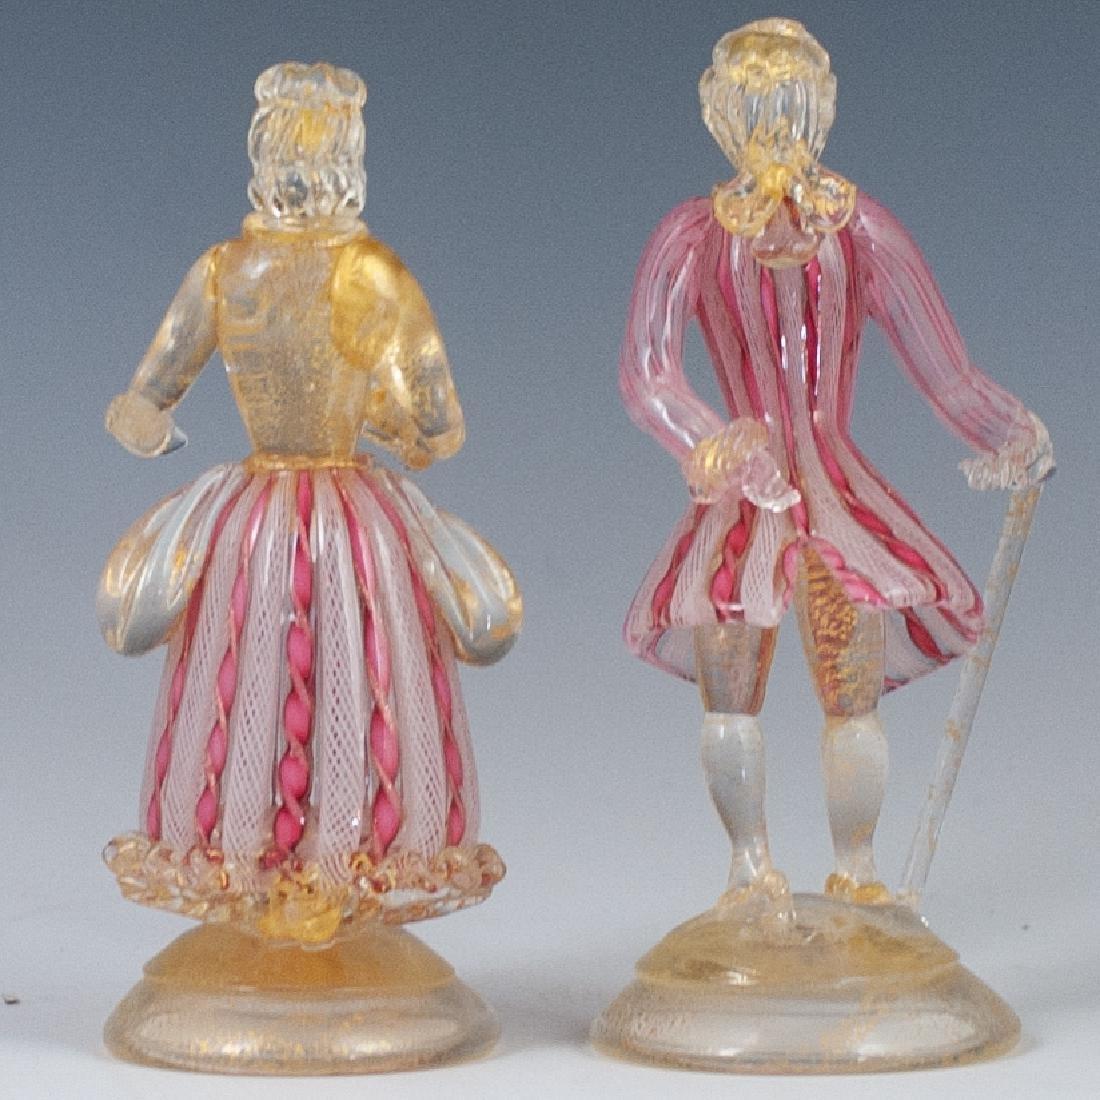 Murano Glass Figurines - 2